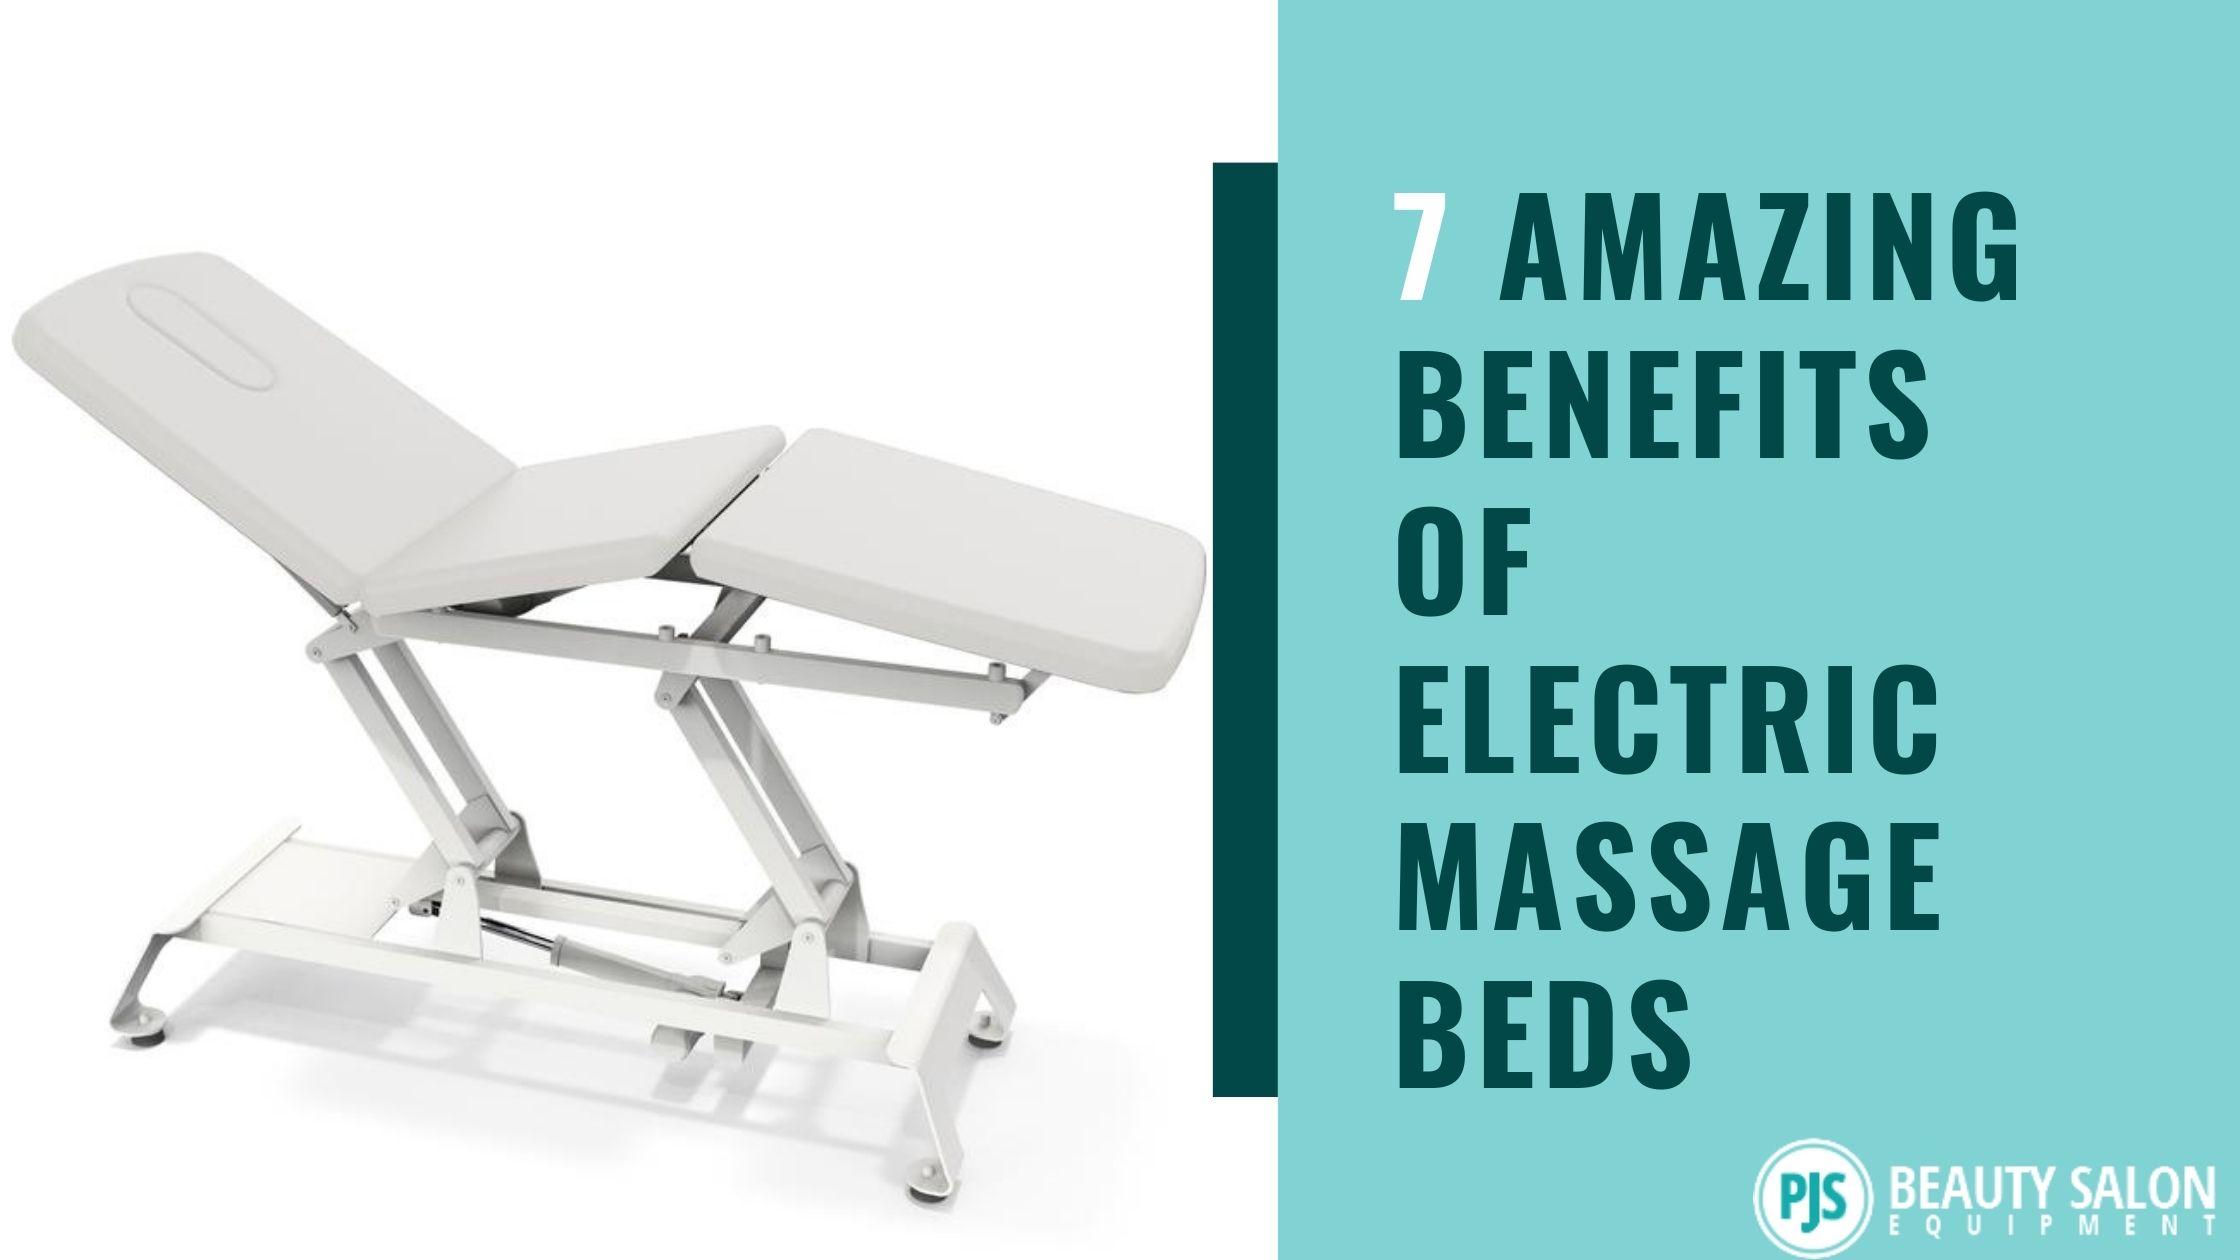 7 Amazing Benefits of Electric Massage Beds